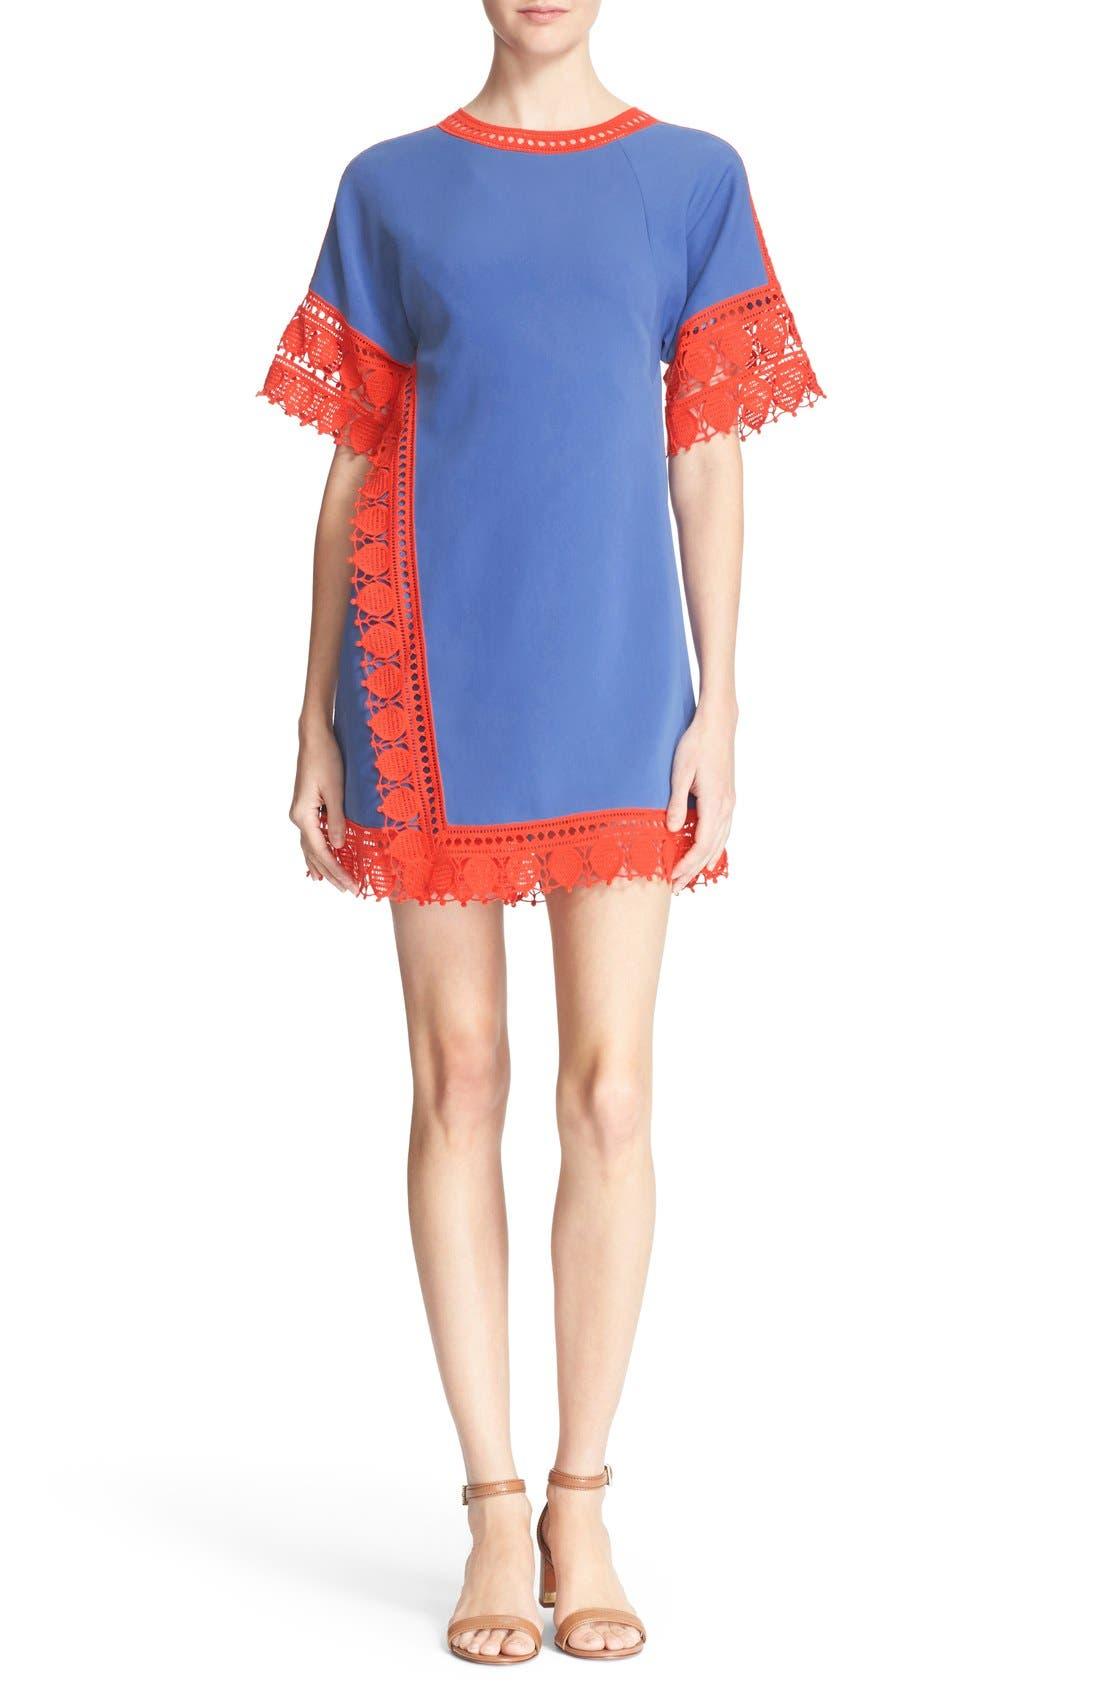 Main Image - Tory Burch 'Marissa' Lace Trim Dress